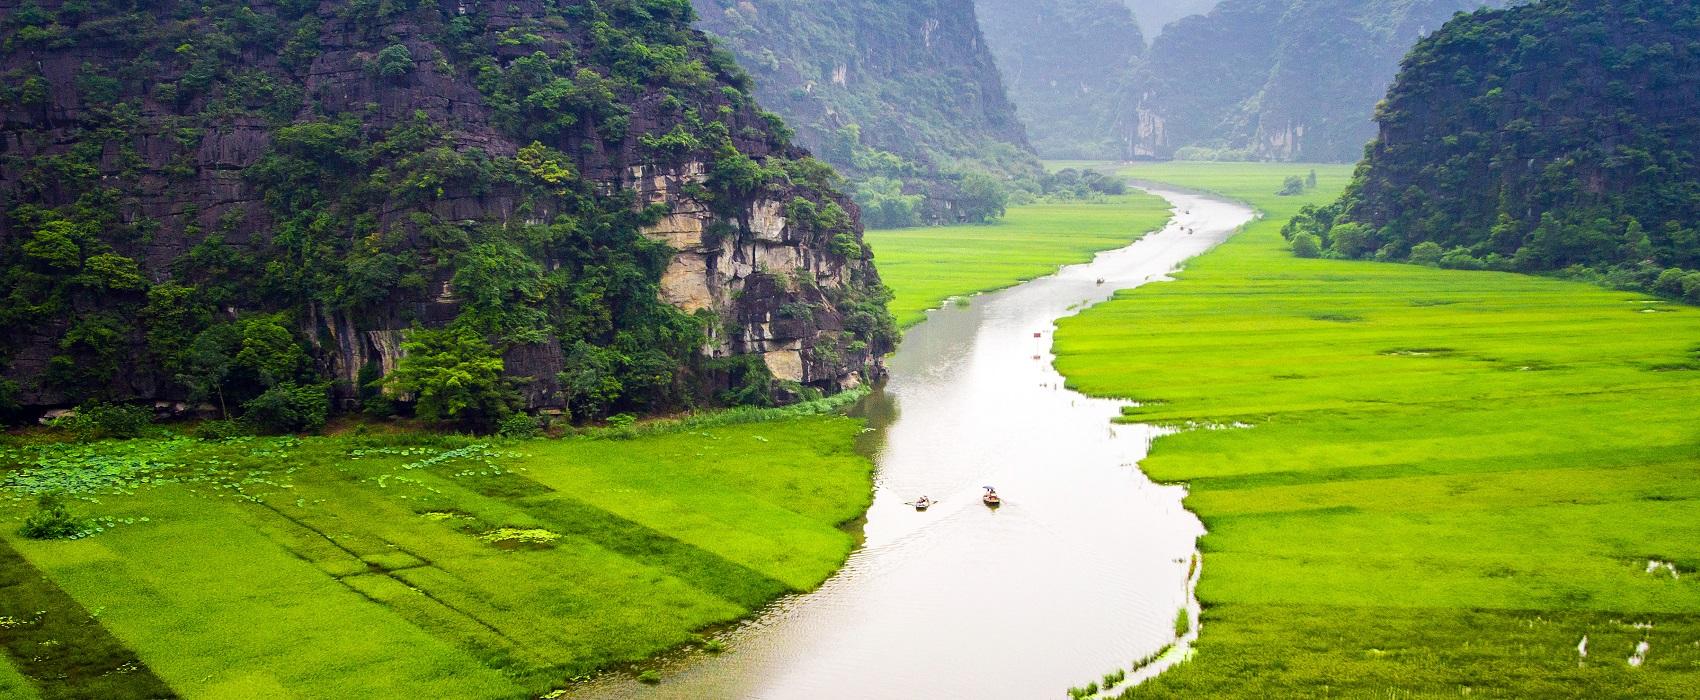 Tam Coc Valley | Asia Hero Travel | Vietnam